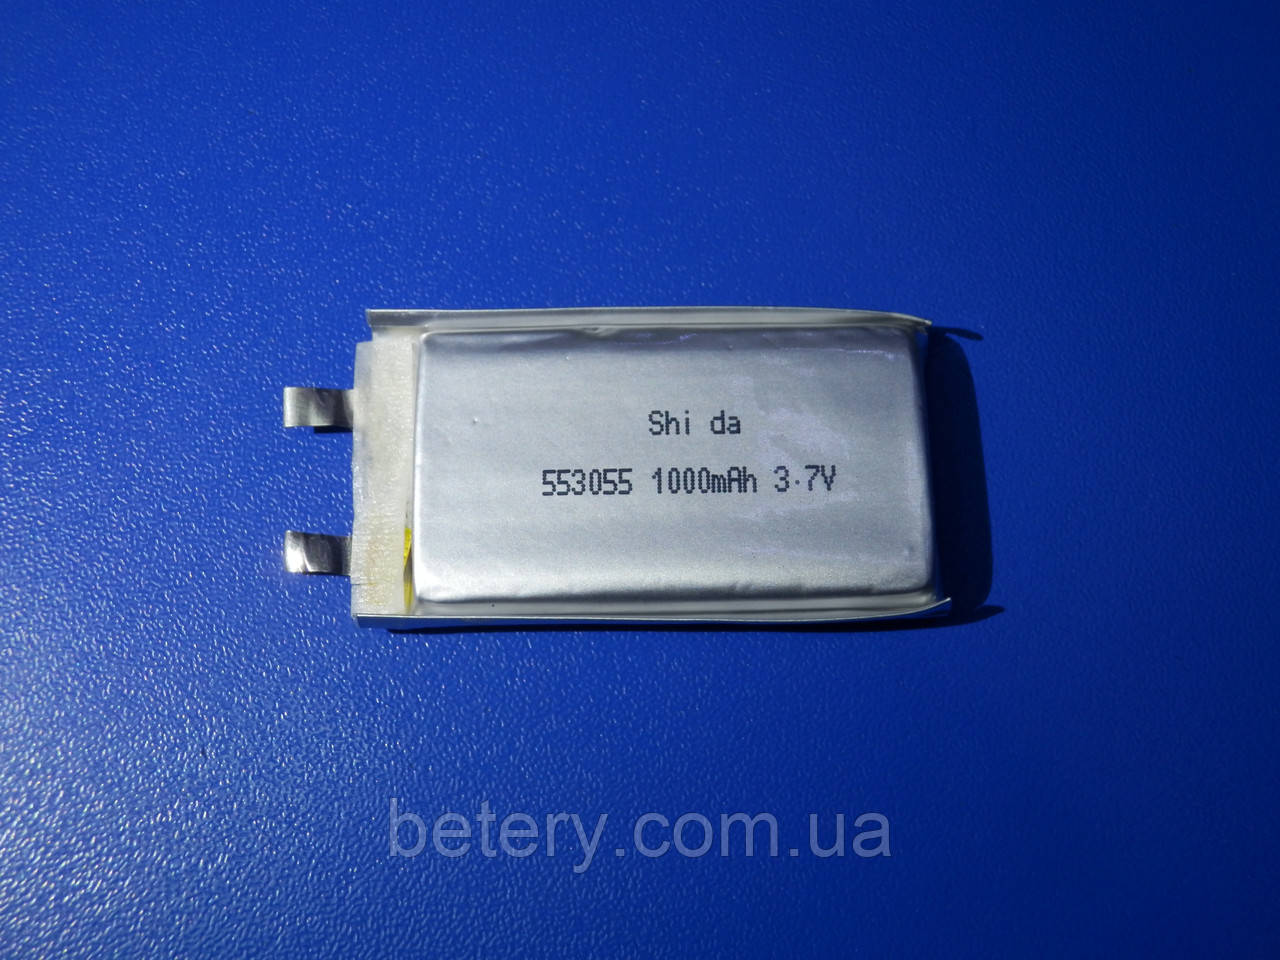 Аккумулятор Li-pol Shida 553055 3,7v 1000mAh